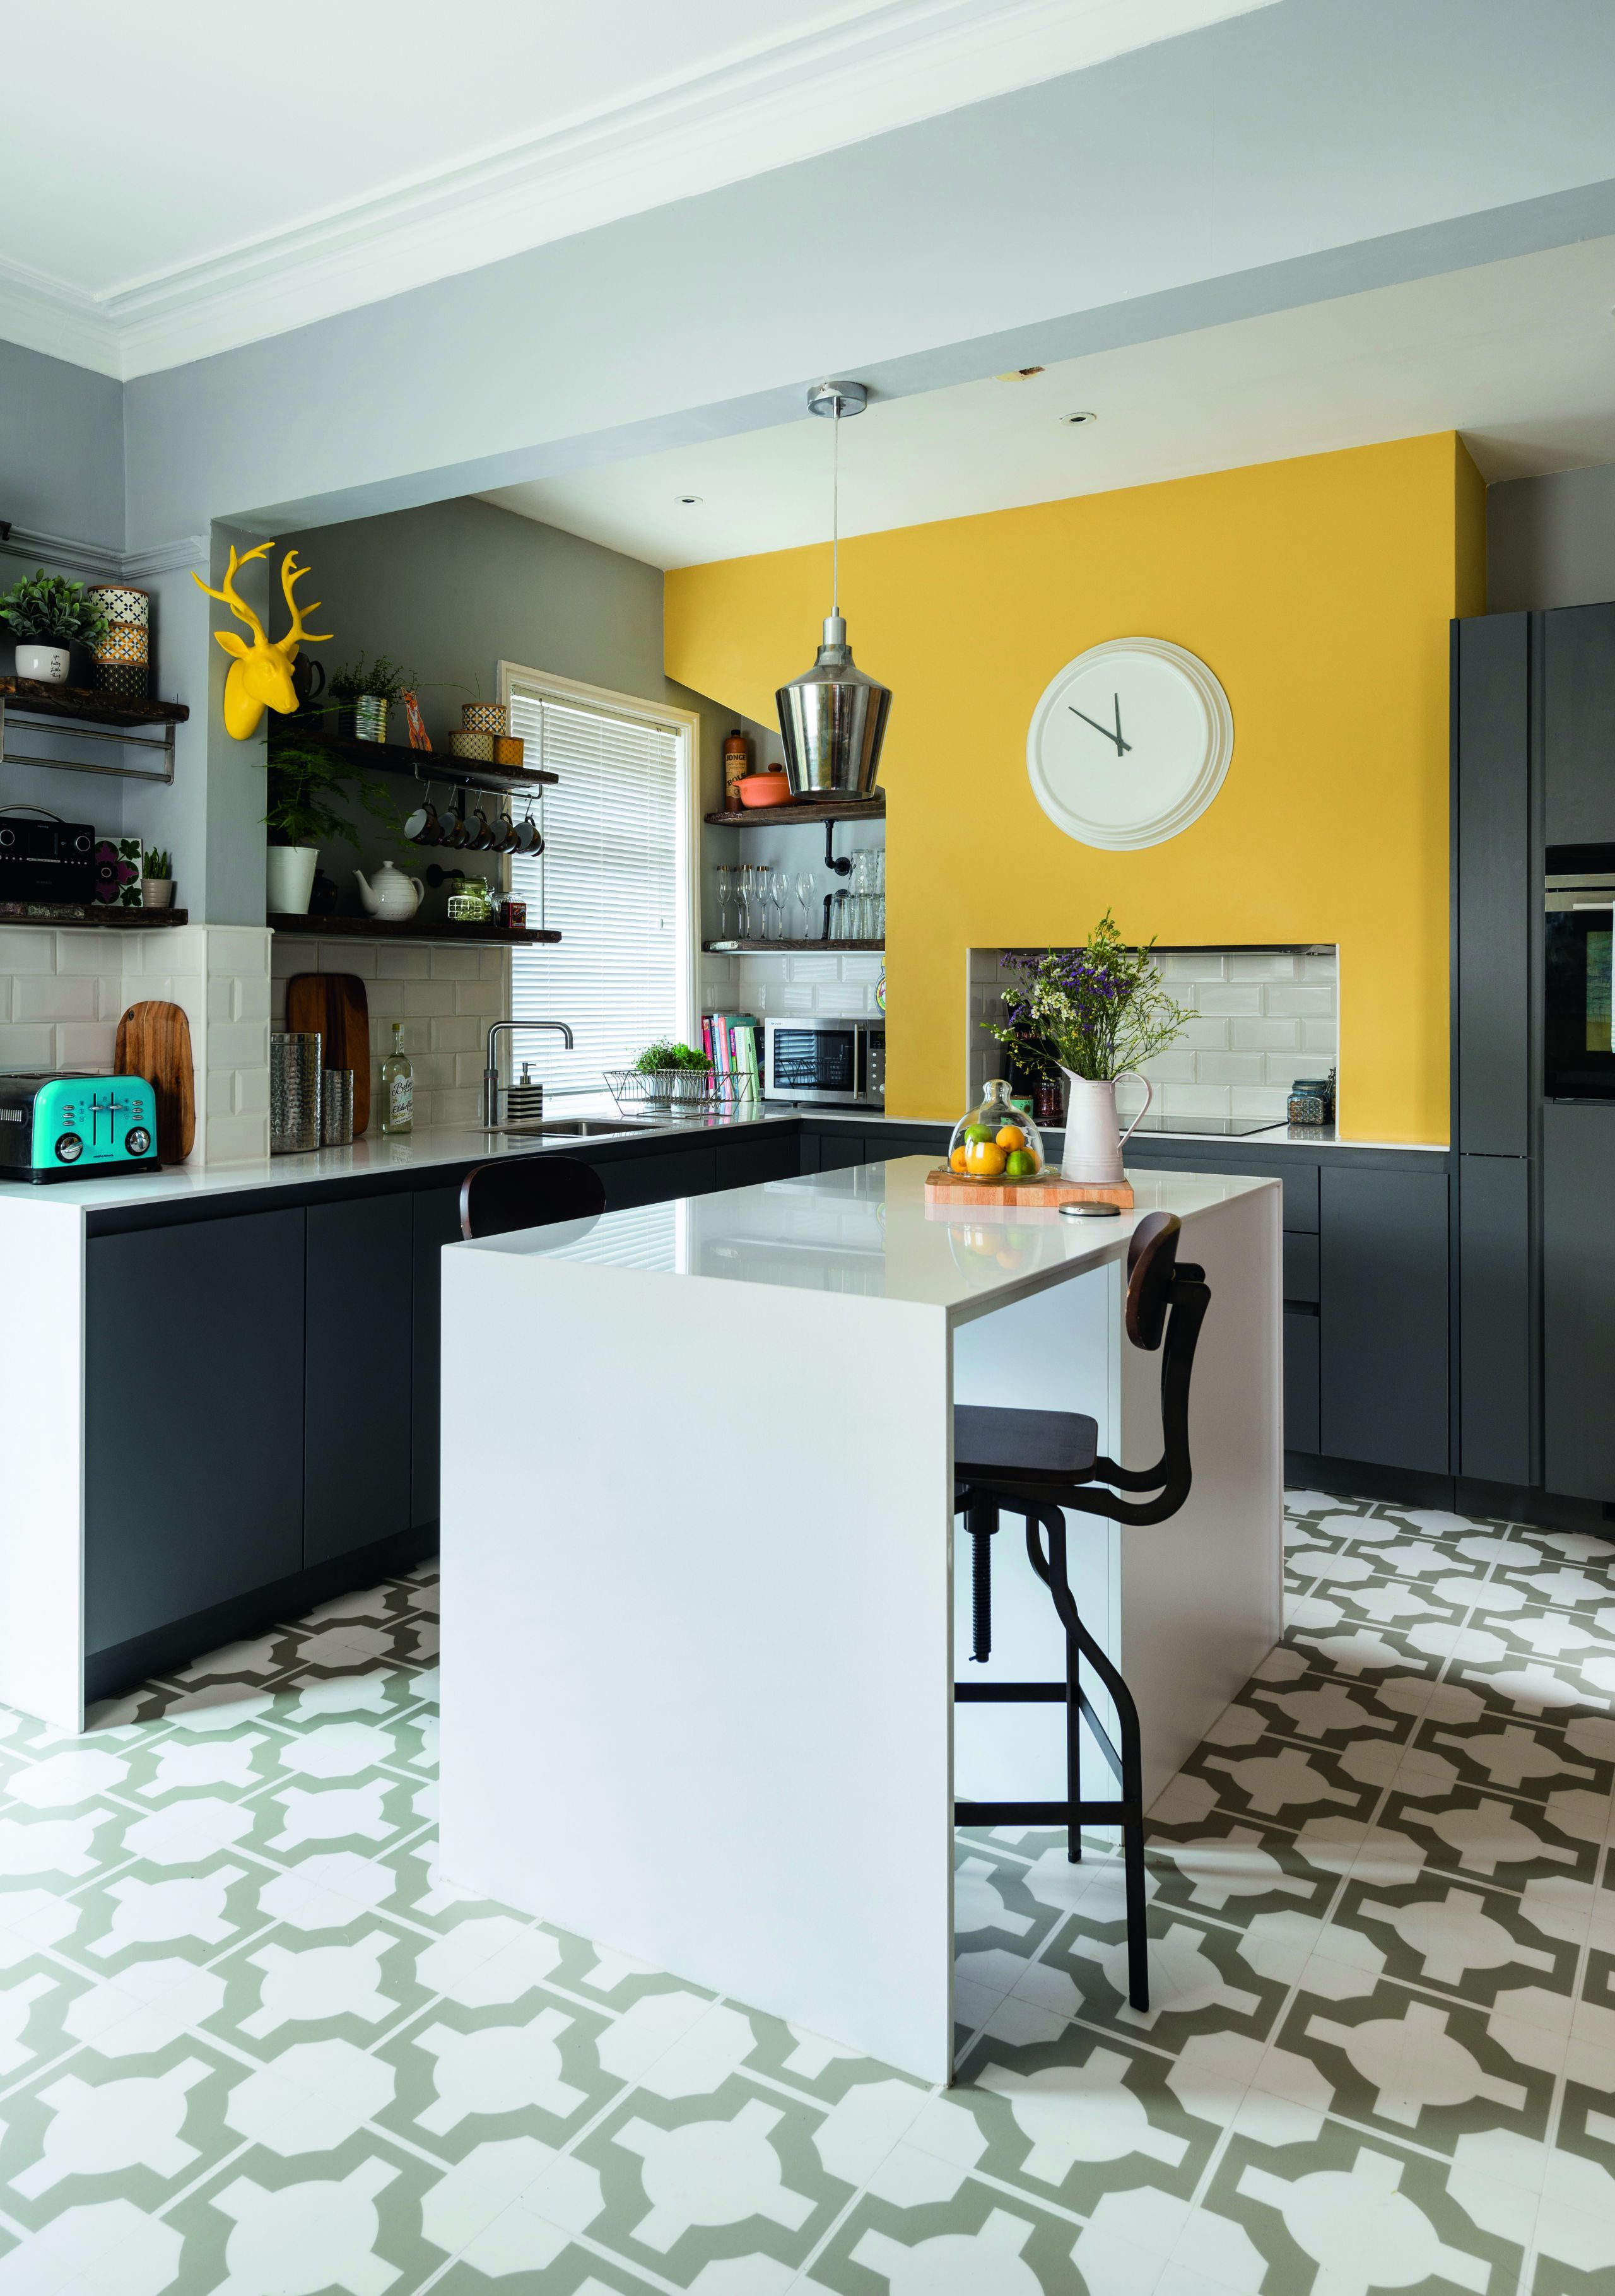 13 Colourful Kitchen Design Ideas Home Yellow Kitchen Walls